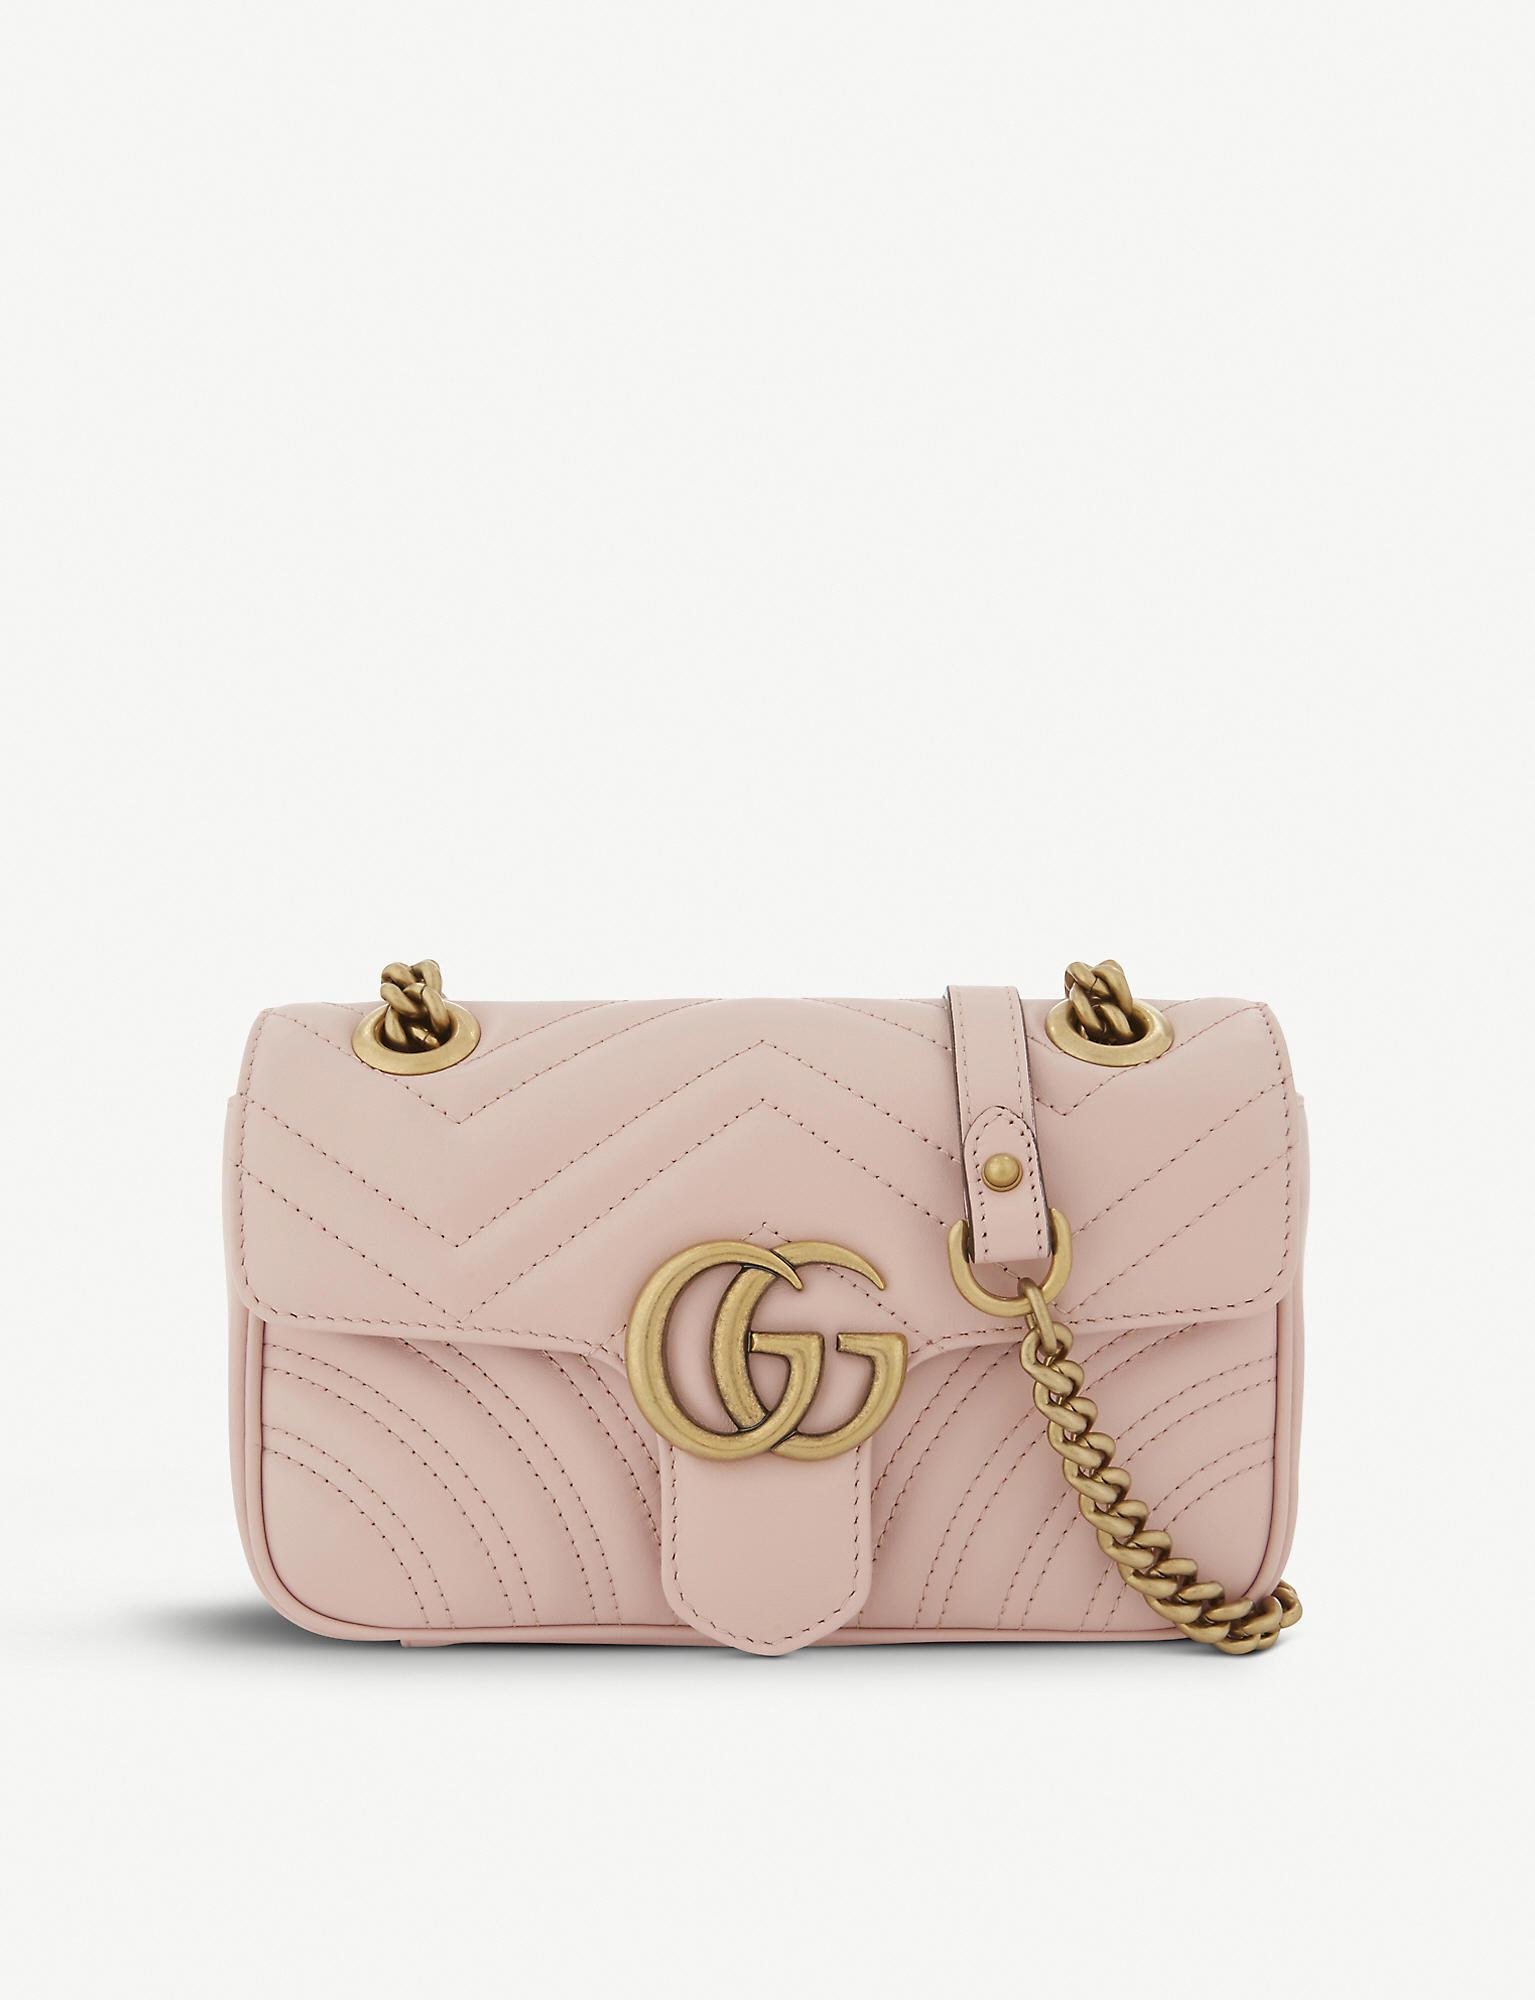 e86868d8f5f4 Gucci Women's Pink Zigzag Marmont GG Mini Leather Cross-body Bag in ...